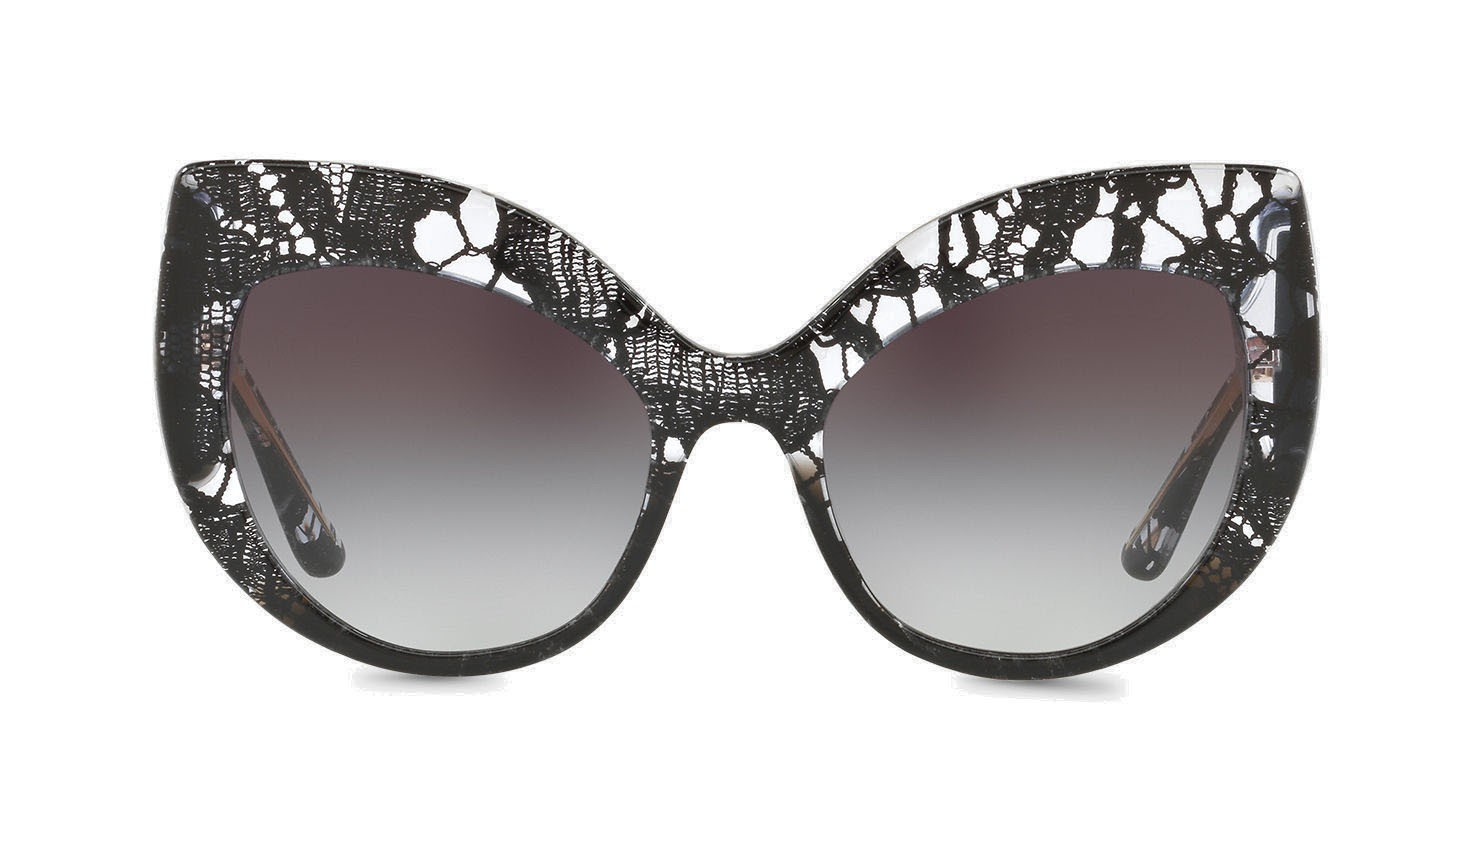 b23c891fdb Dolce   Gabbana - Cat-Eye Sunglasses in Acetate Lace - Gradient Black Lace  - Dolce   Gabbana Eyewear